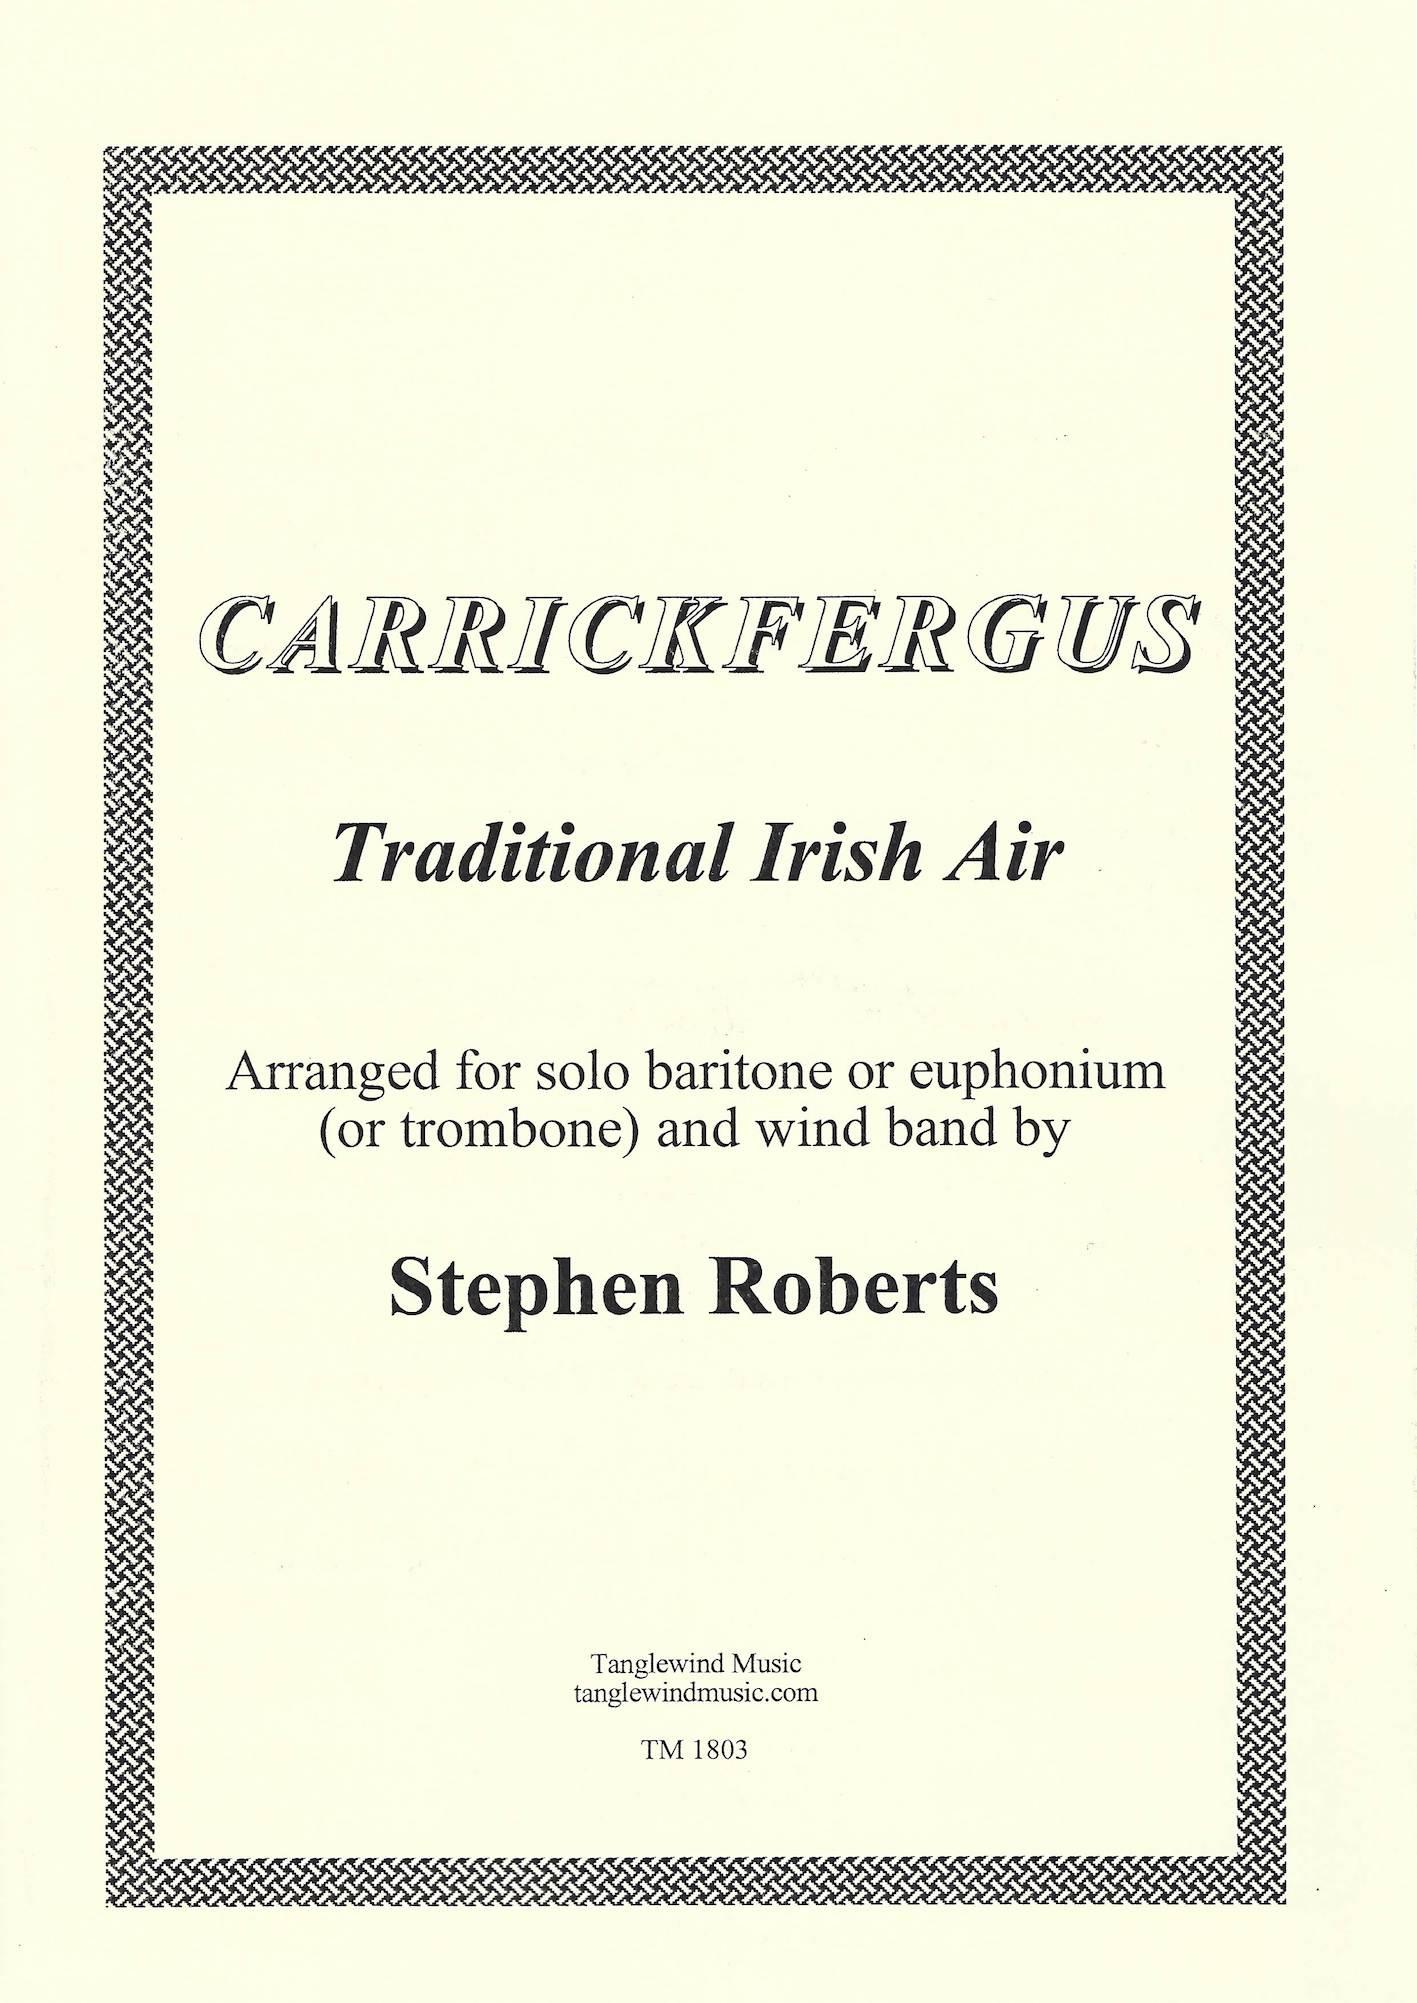 Carrickfergus - Trad. Irish Air Arr. Stephen Roberts - Euphonium (or baritone or trombone) and Wind Band